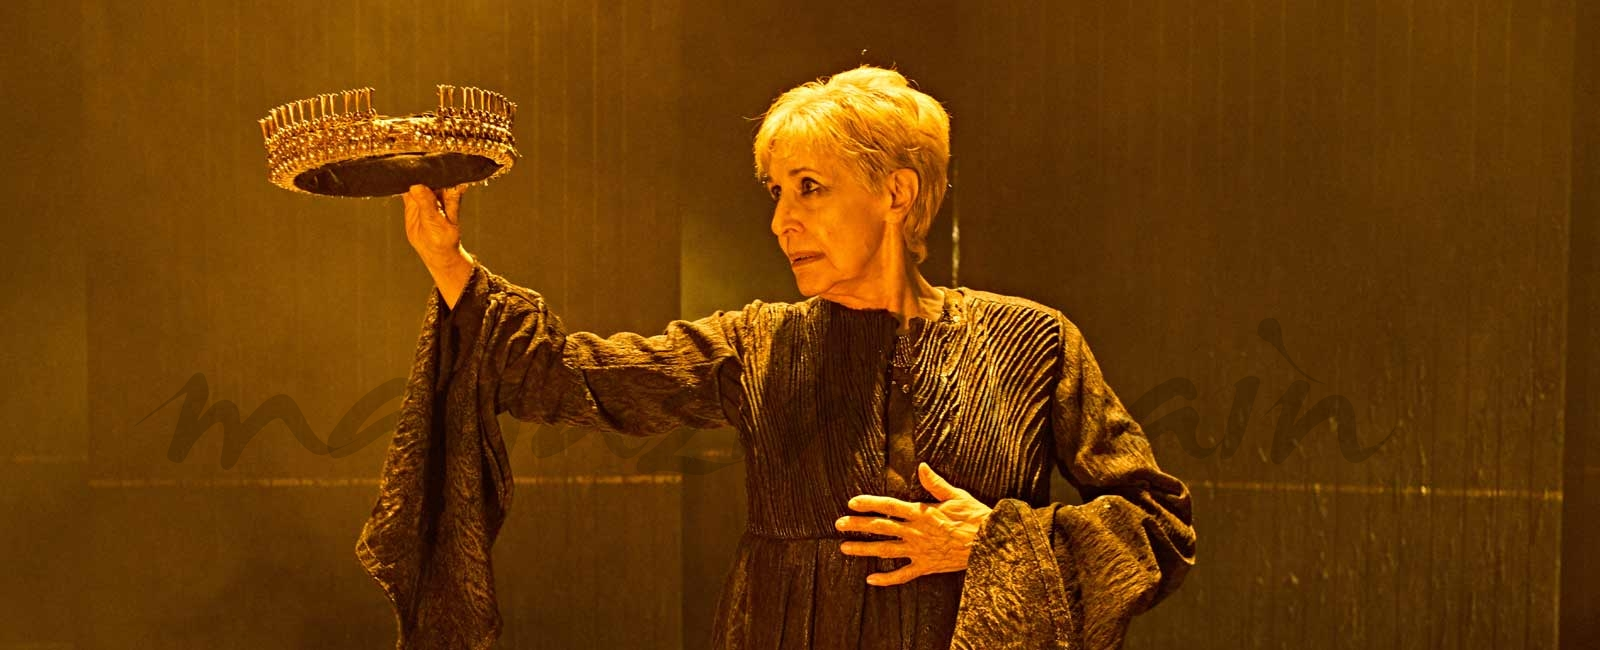 «Reina Juana», con Concha Velasco, llega al Teatro La Abadía